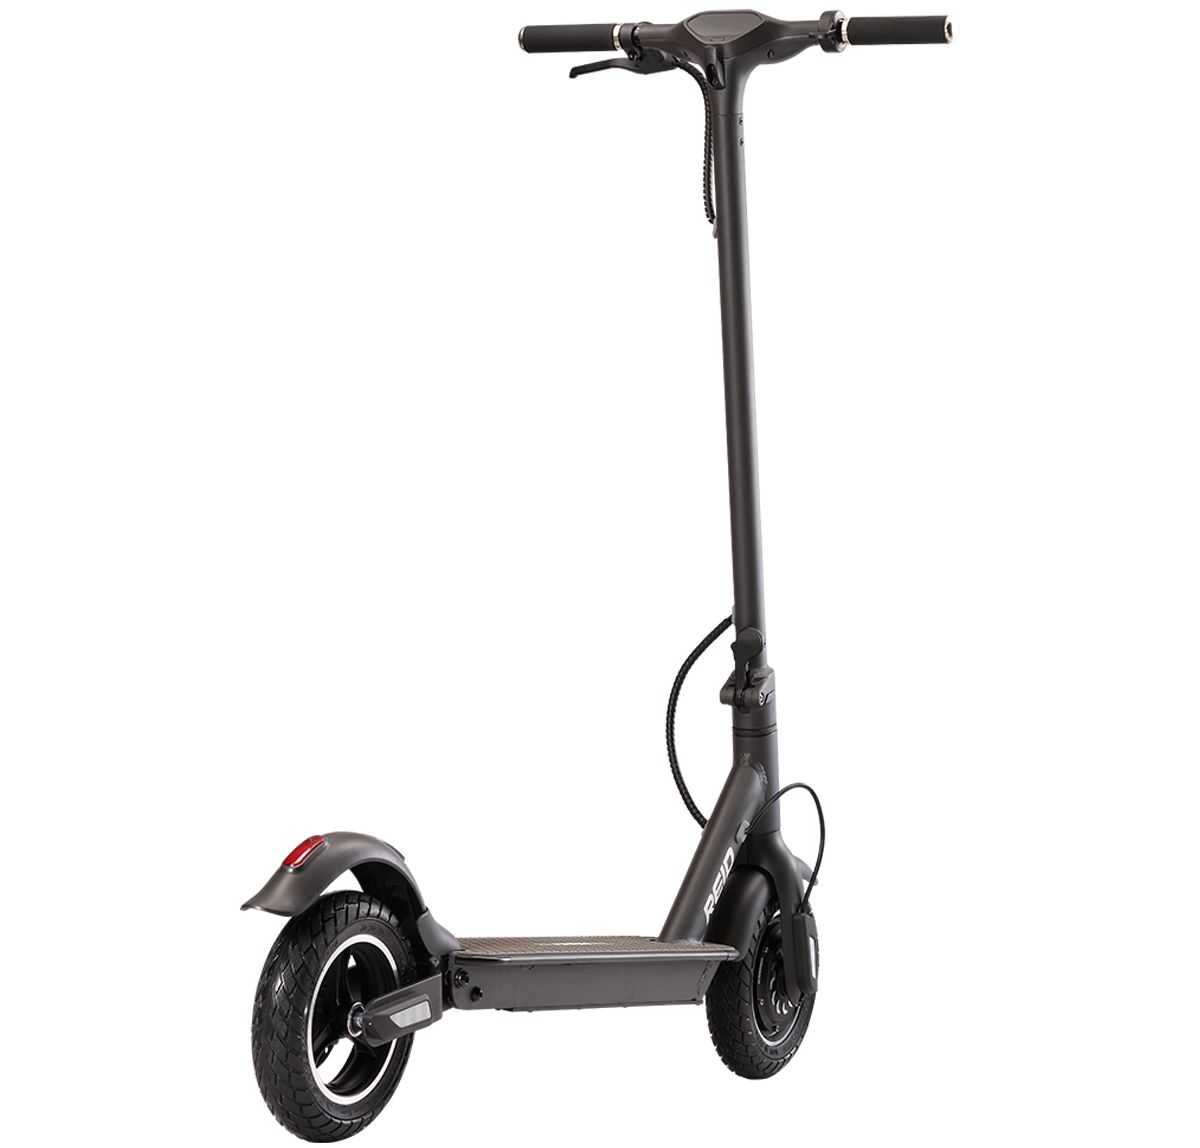 Reid E4 Plus electric scooter